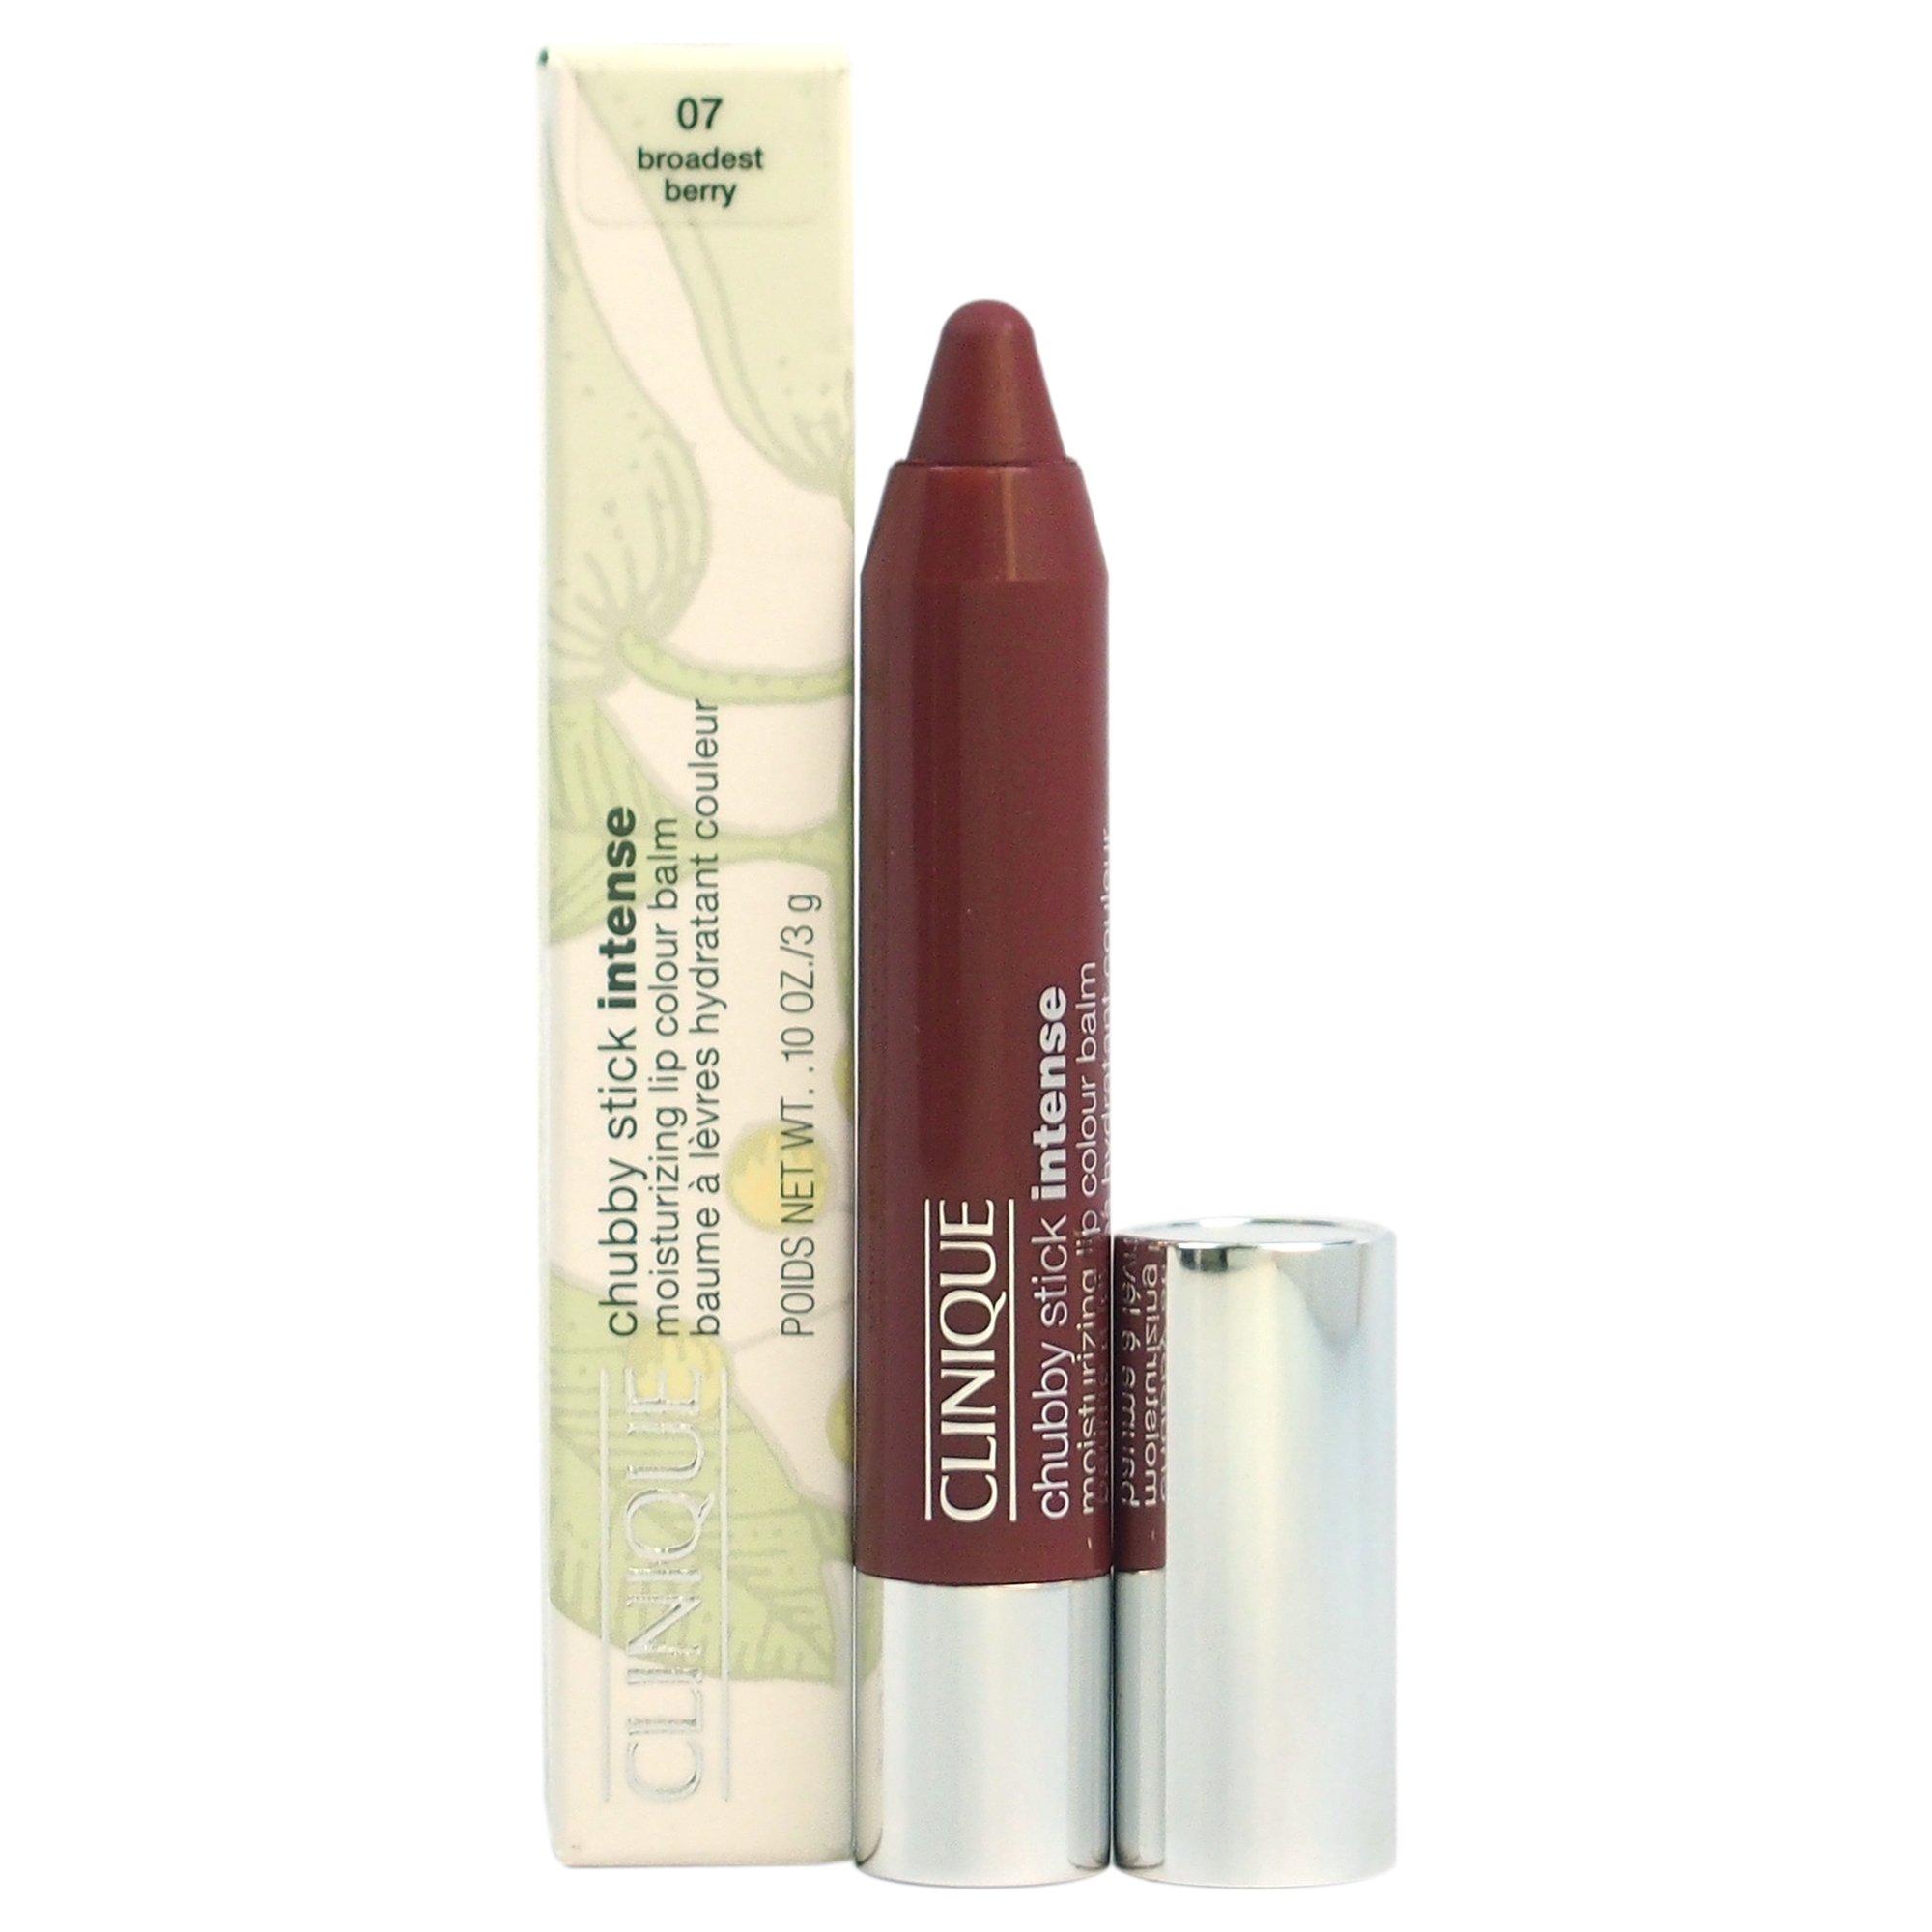 Clinique Chubby Stick Intense Moisturizing Lip Color Balm, No. 07 Broadest Berry, 0.1 Ounce